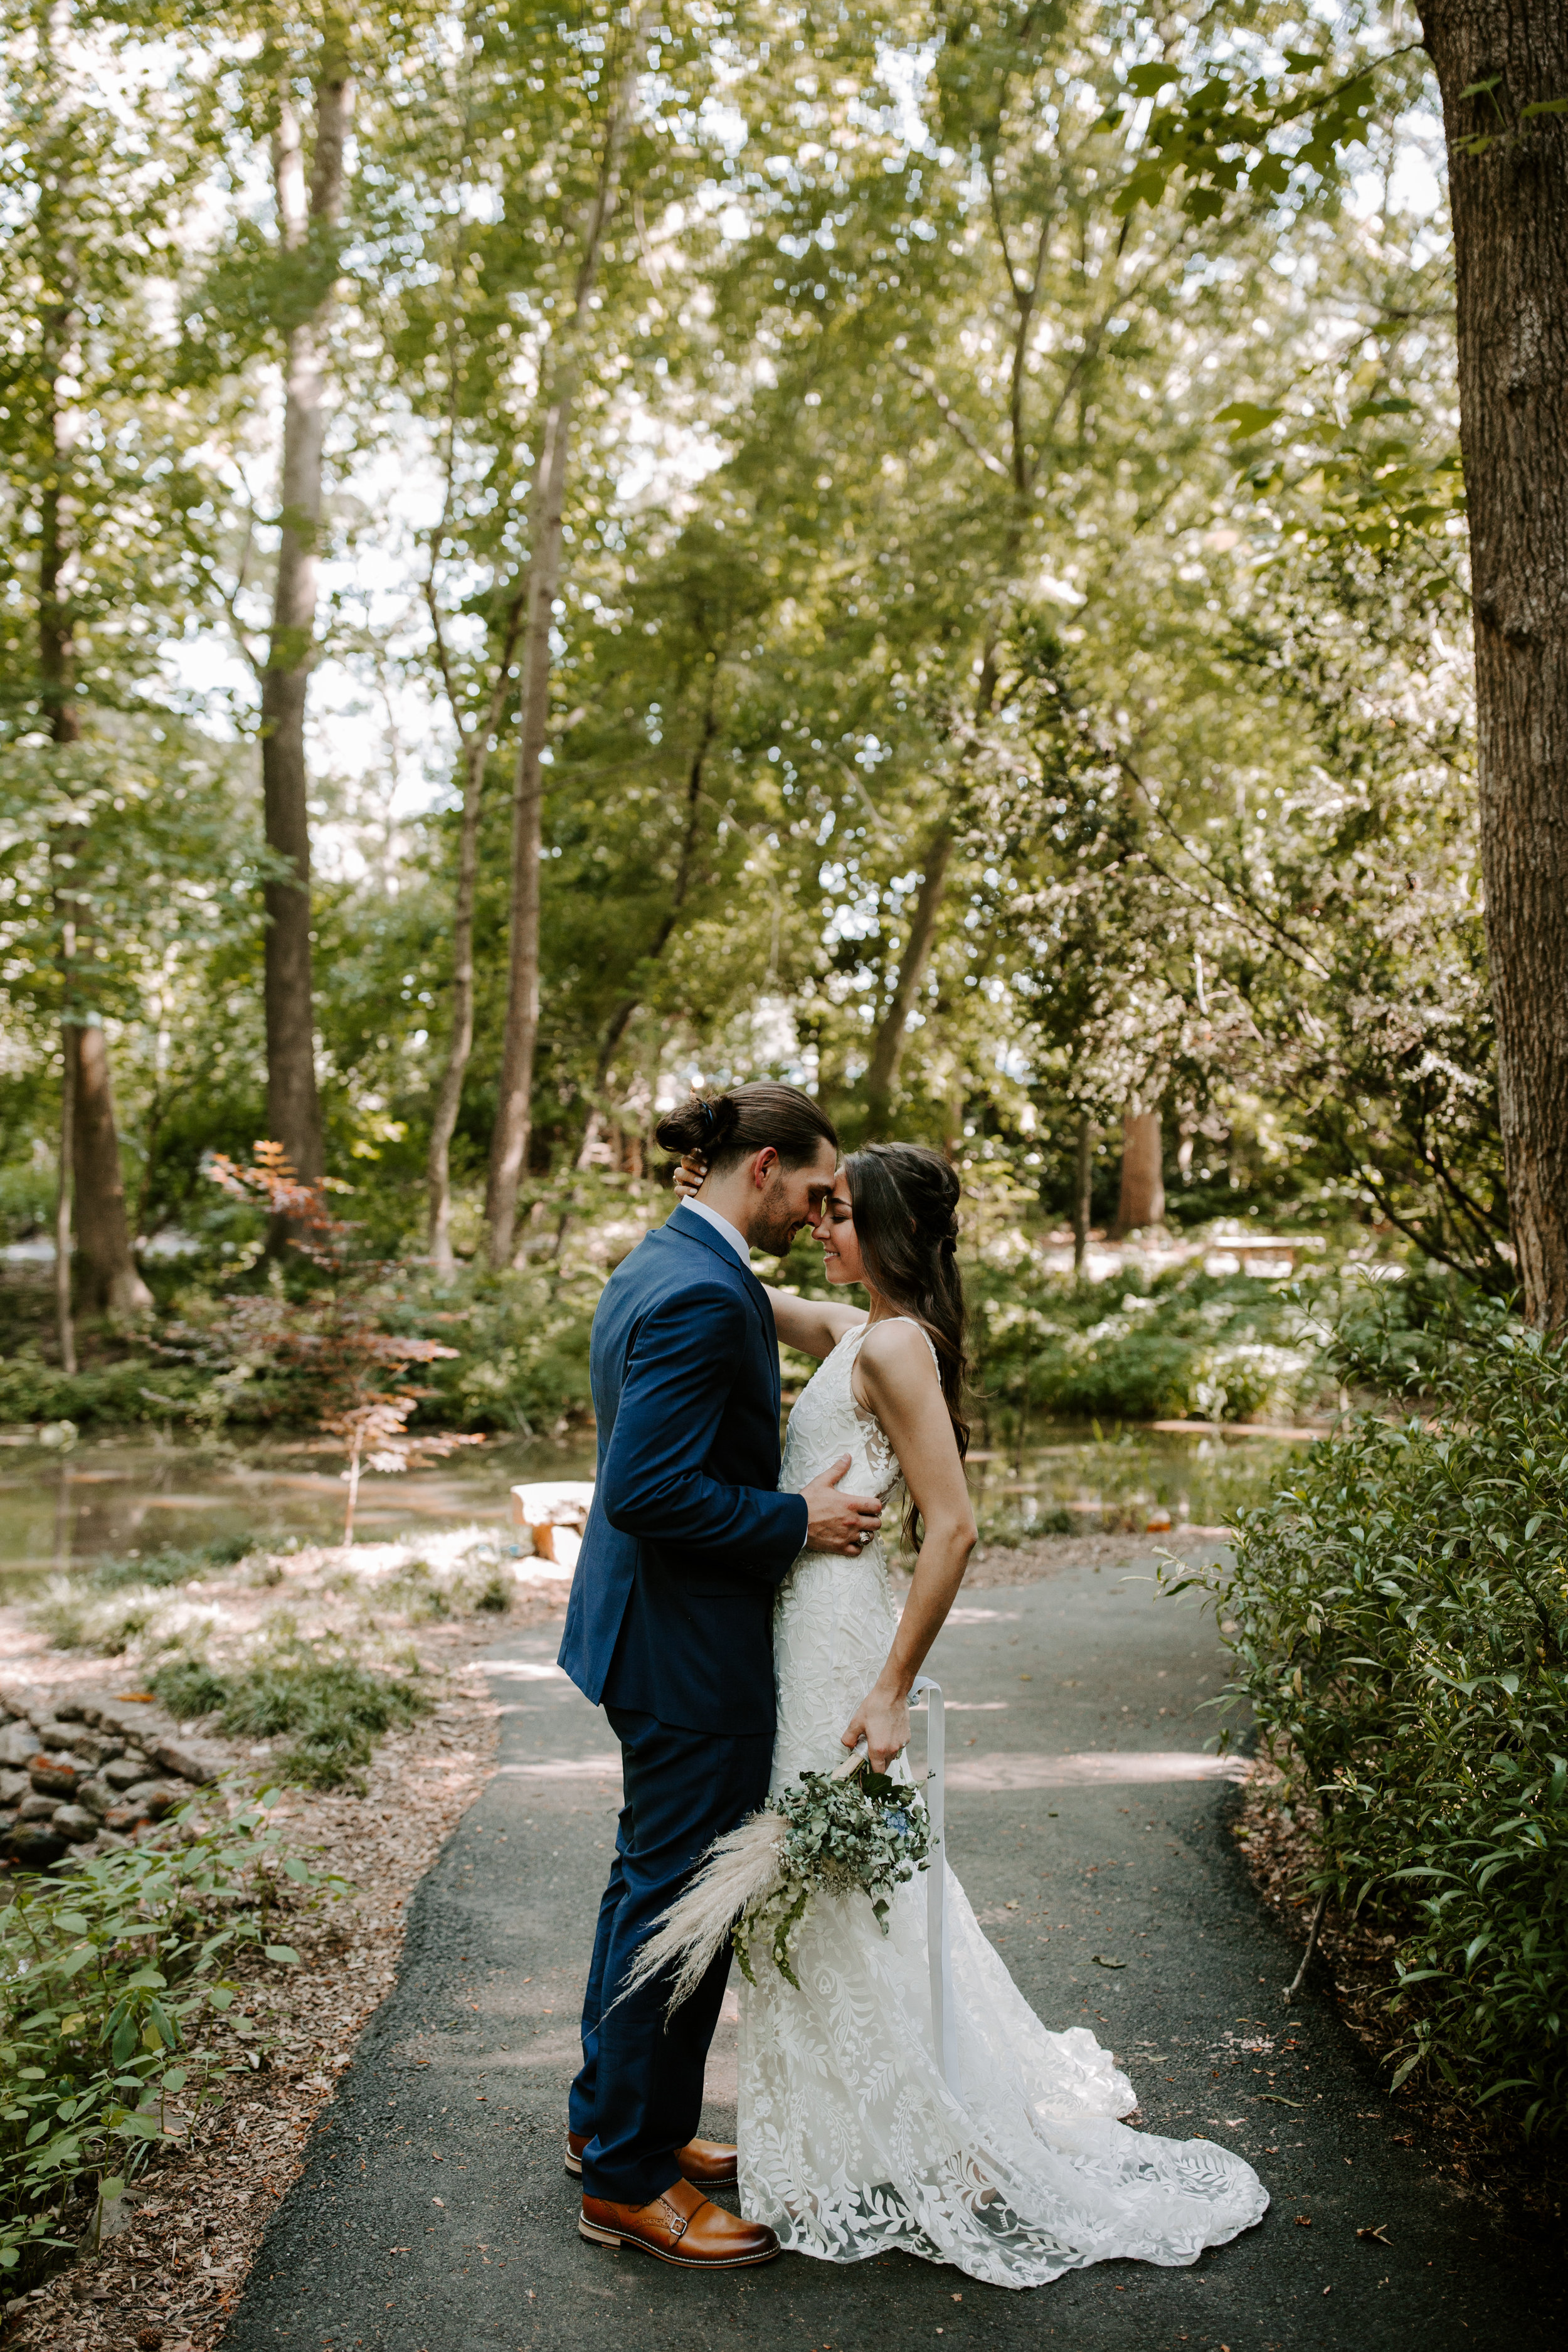 daywedding-364.jpg